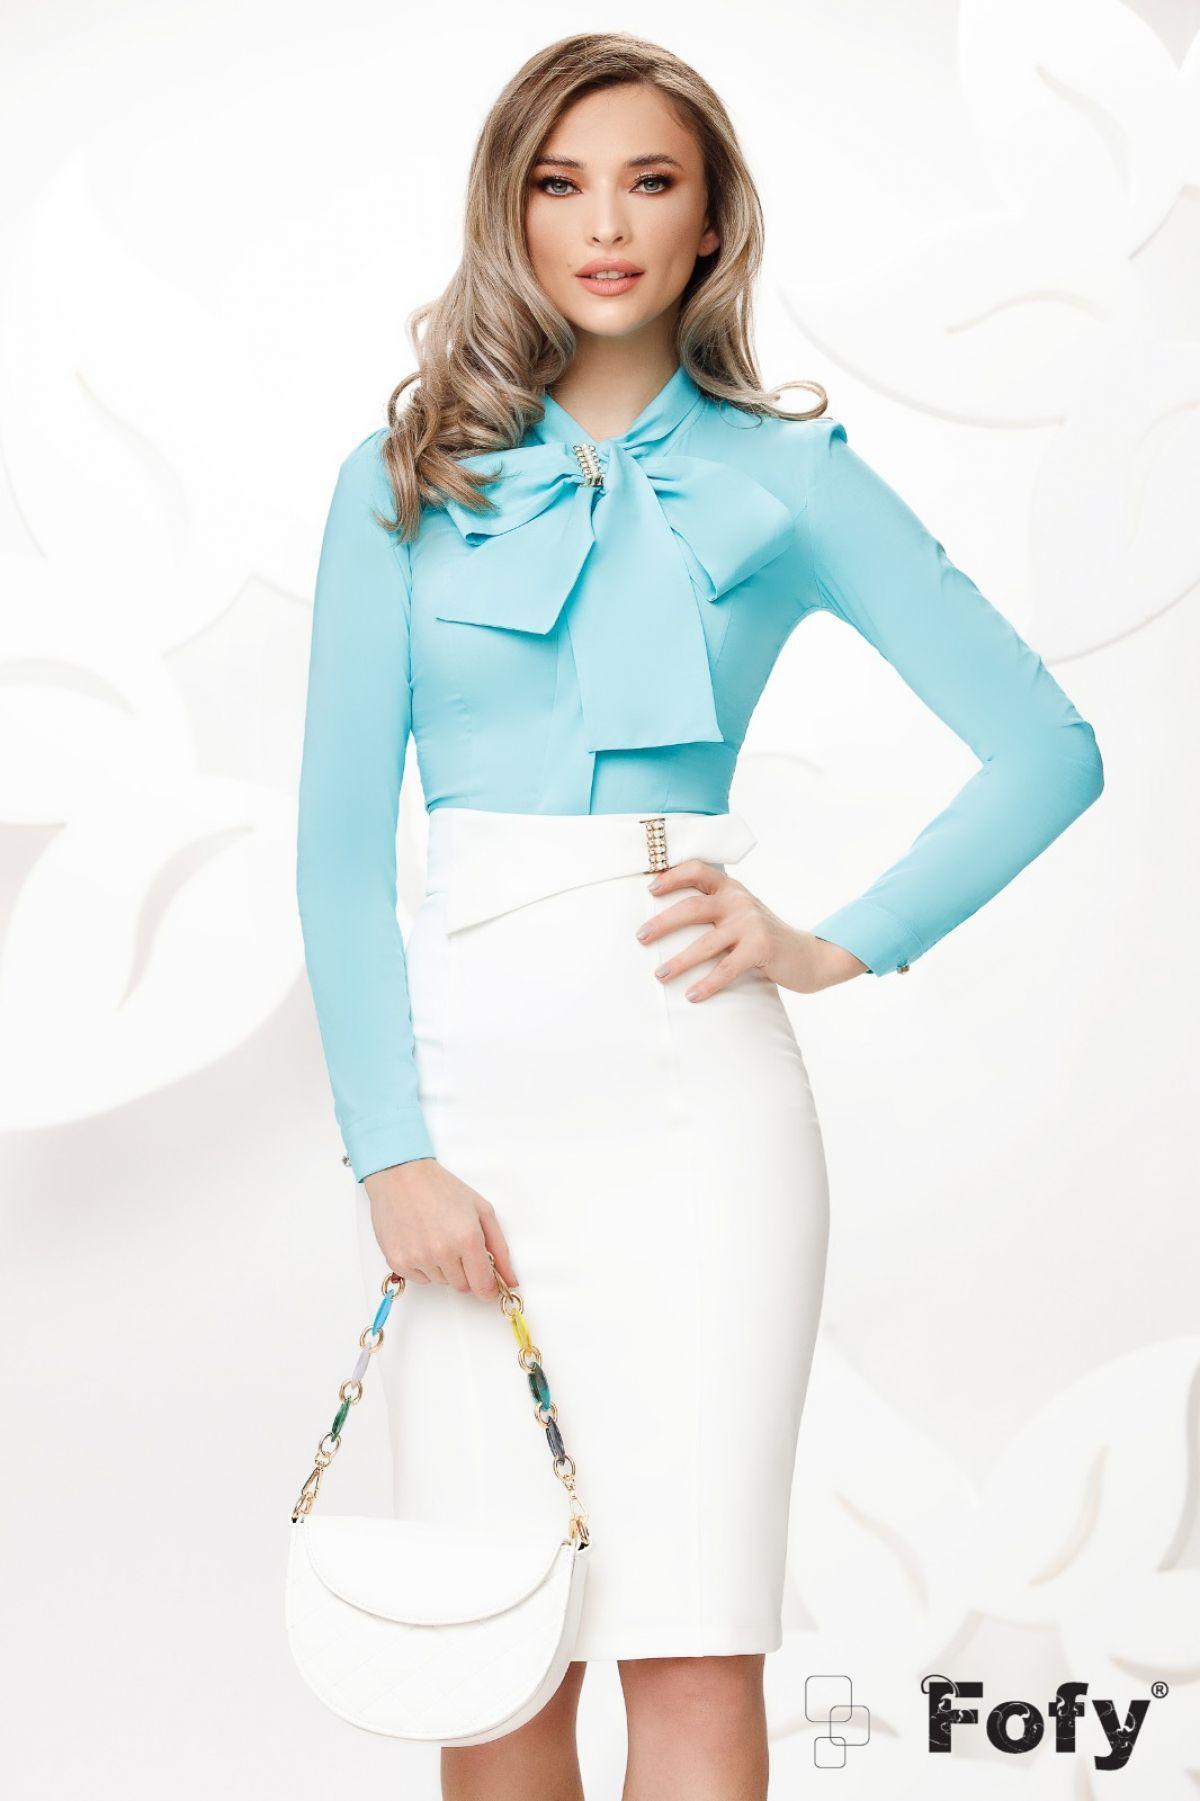 Camasa Fofy eleganta turquoise cu funda maxi si accesoriu tip brosa